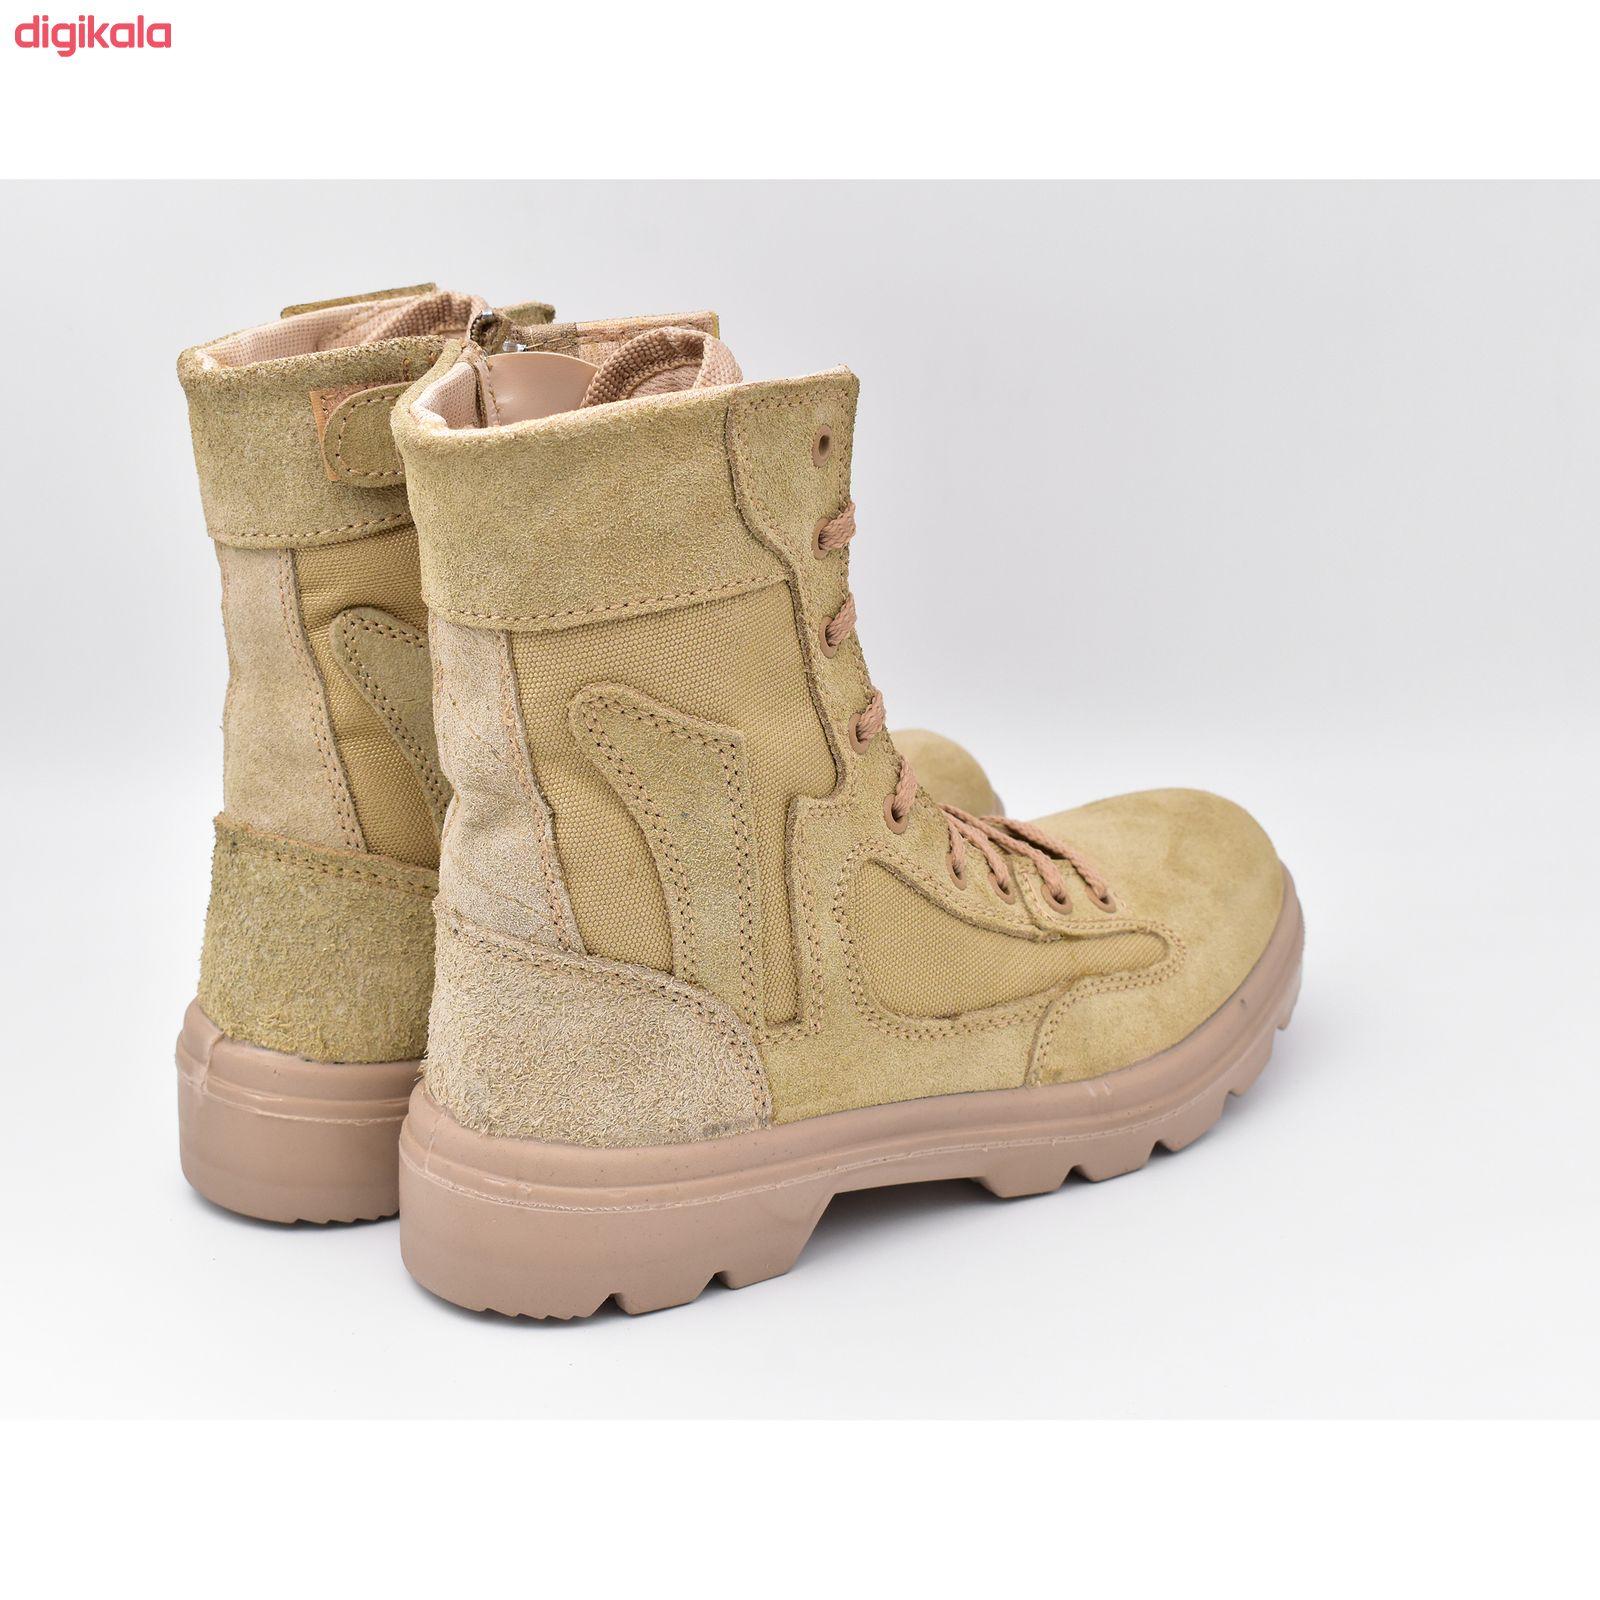 کفش کوهنوردی مردانه مدل Razm کد 8485 main 1 8